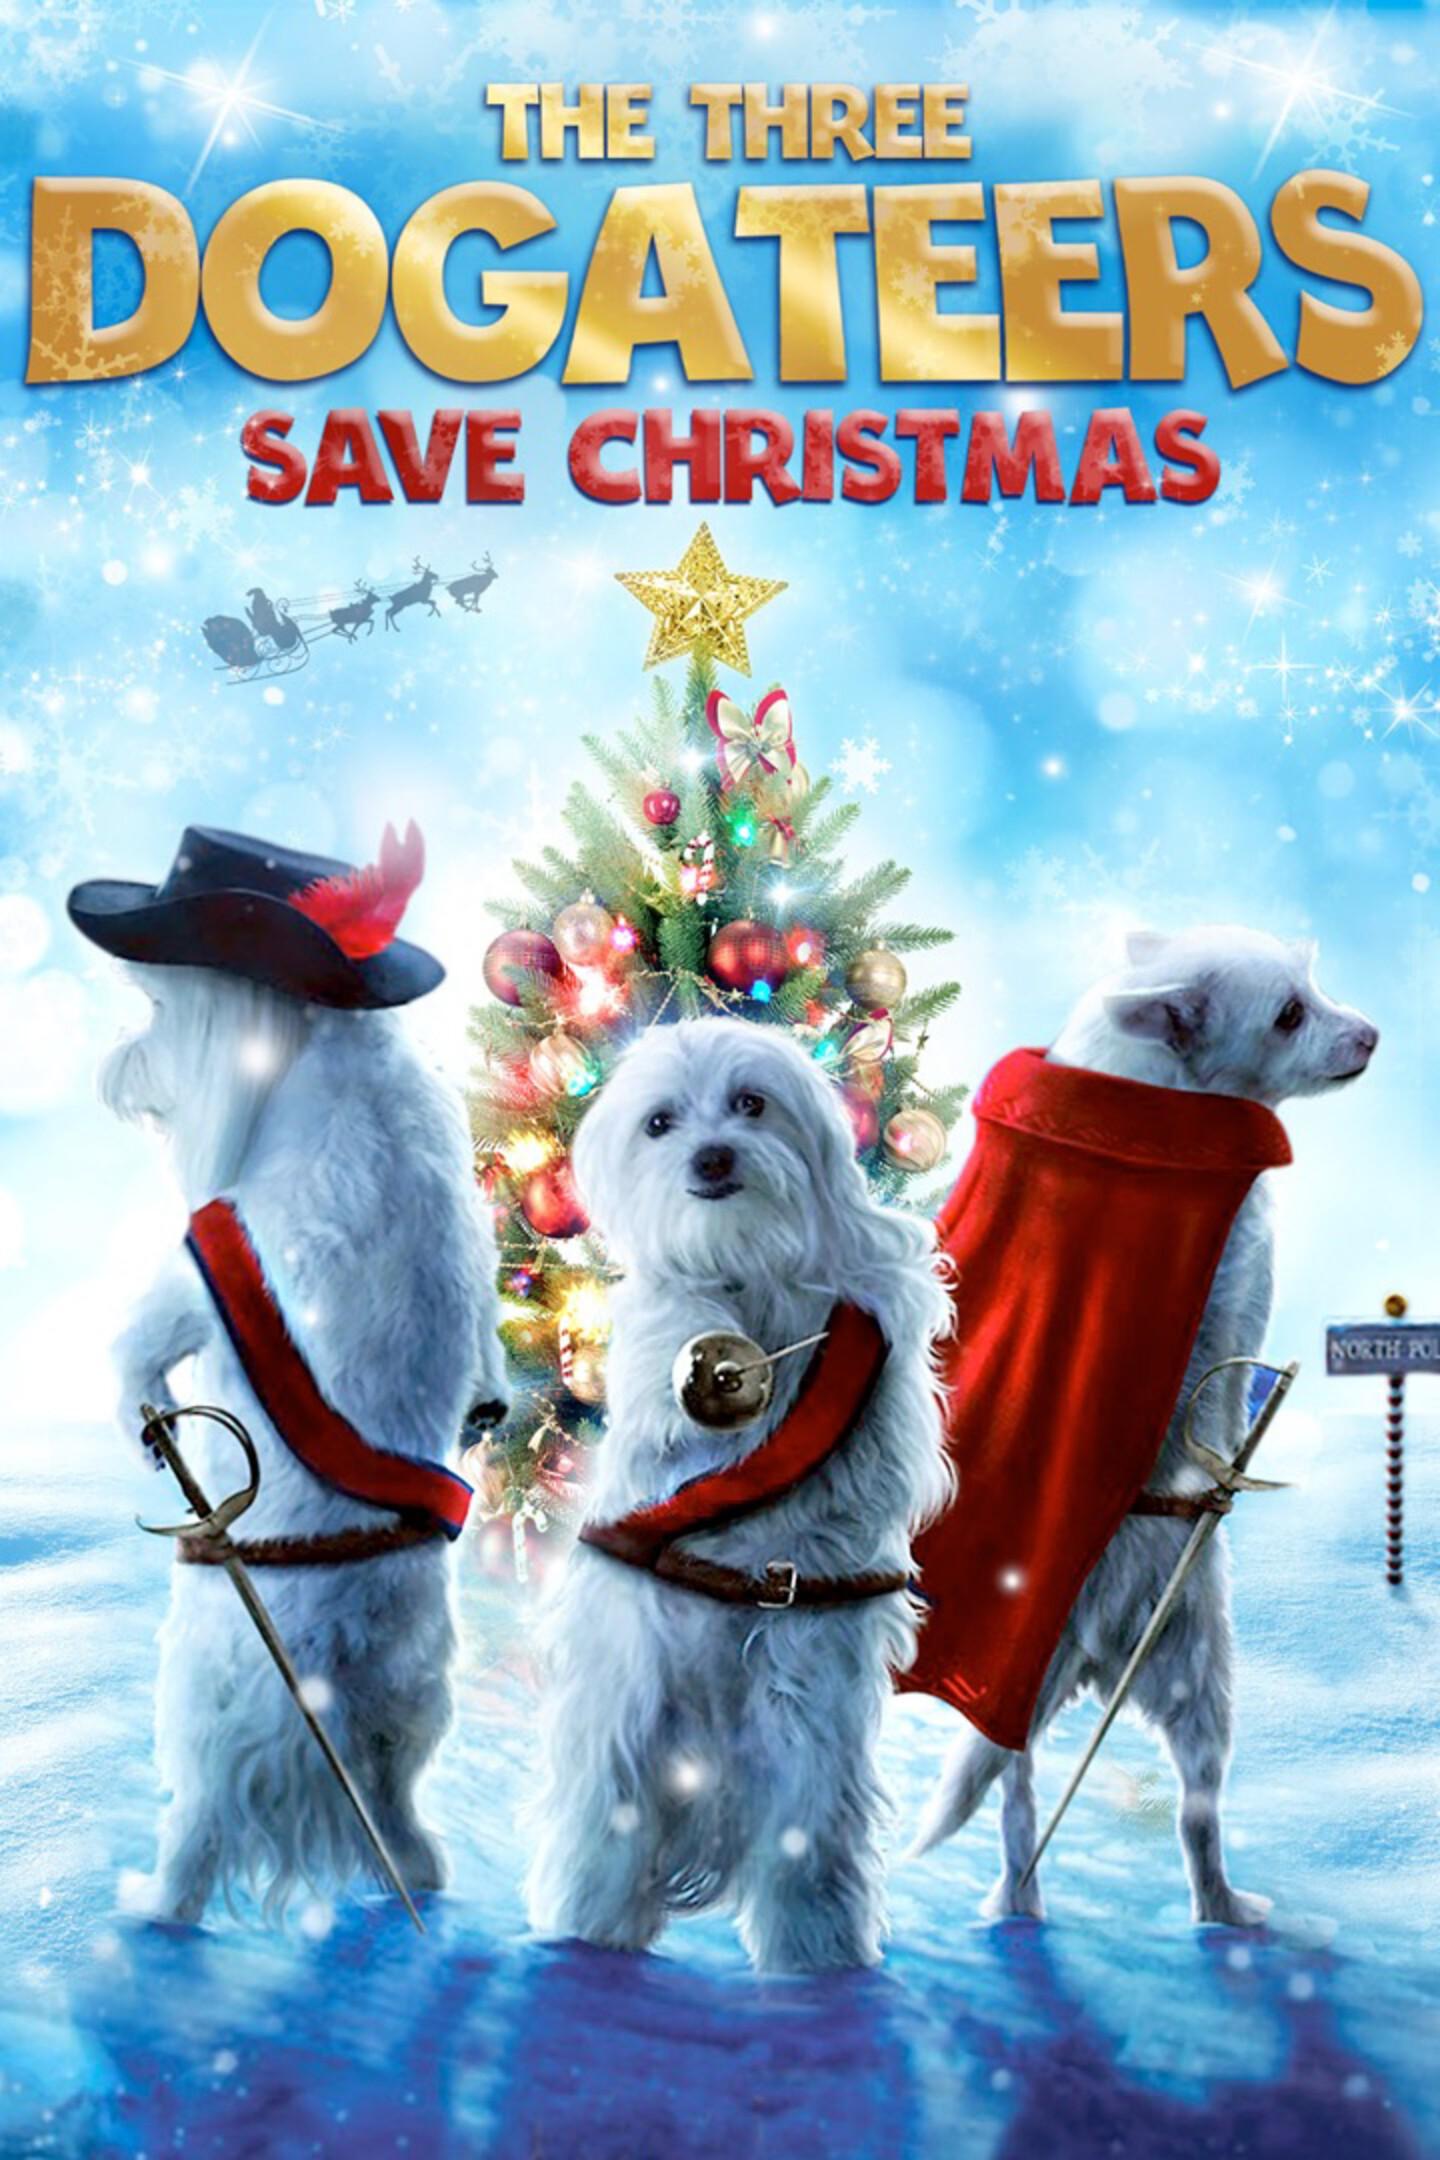 Three Dogateers Save Christmas, The